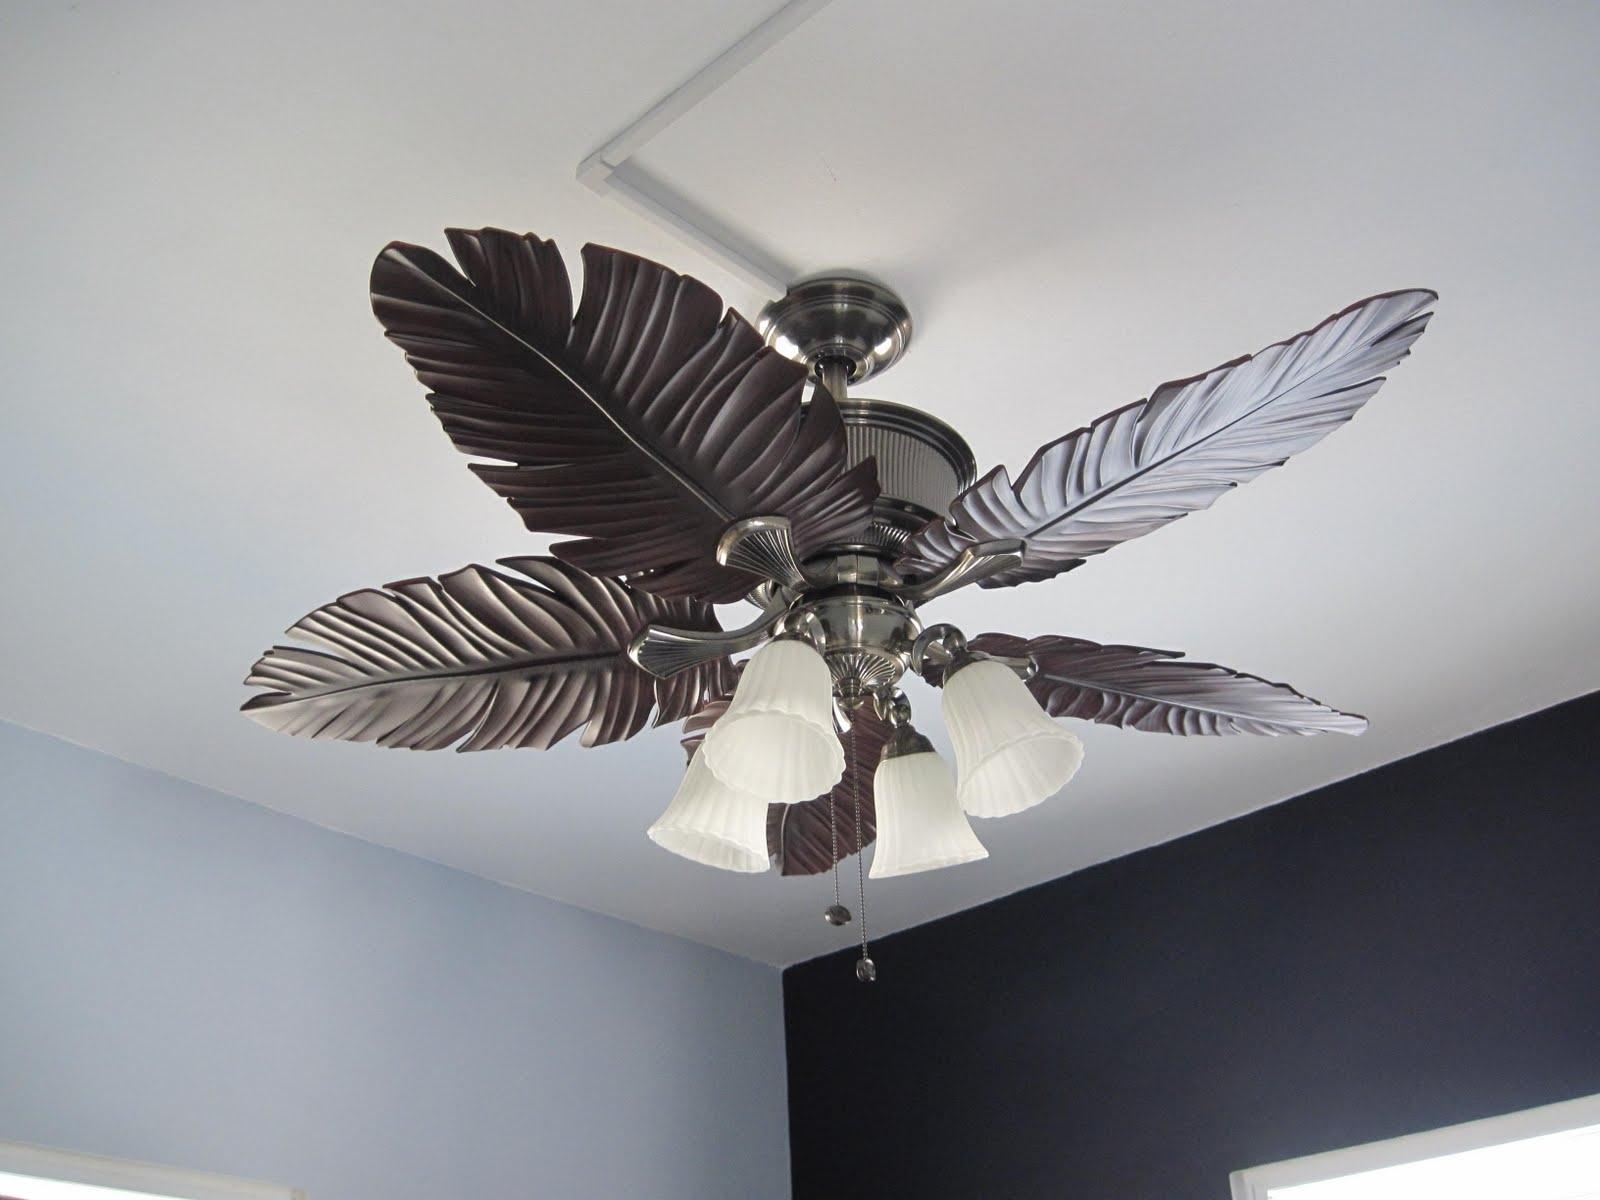 Famous Ceiling Lights : Tropical Ceiling Fans With Lights For Low Ceilings With Regard To Tropical Outdoor Ceiling Fans With Lights (View 12 of 20)